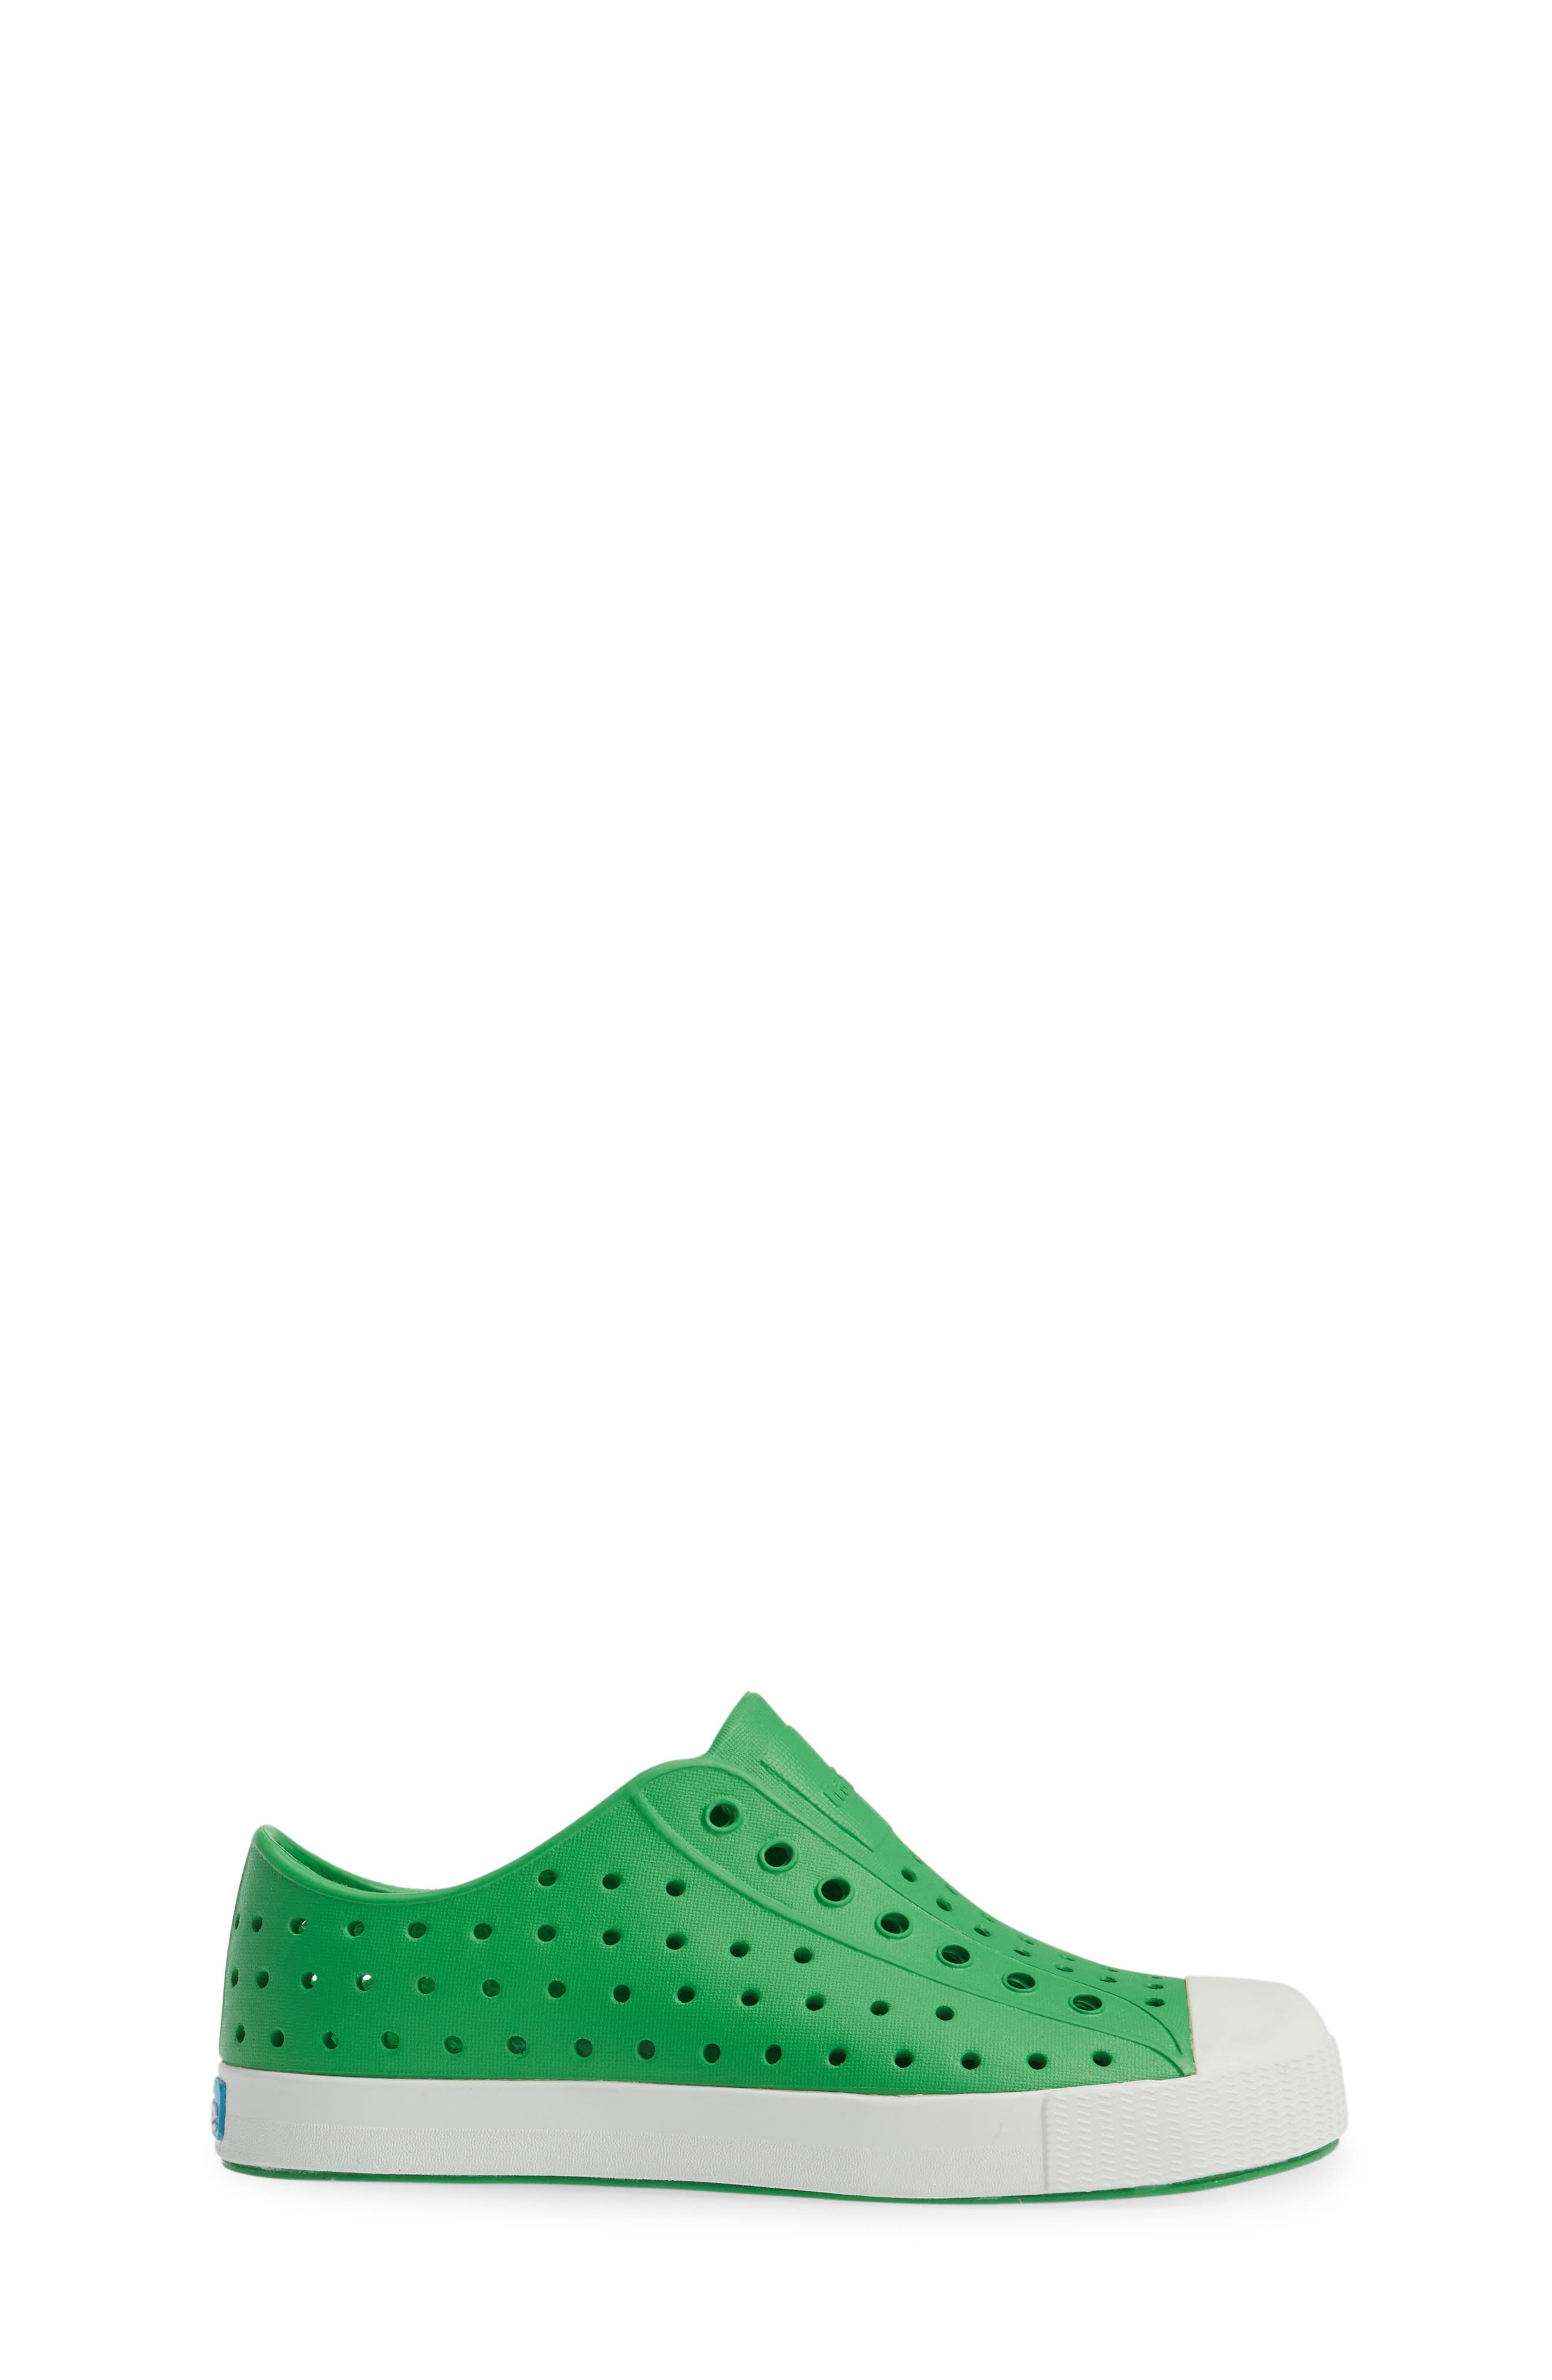 'Jefferson' Water Friendly Slip-On Sneaker,                             Alternate thumbnail 171, color,